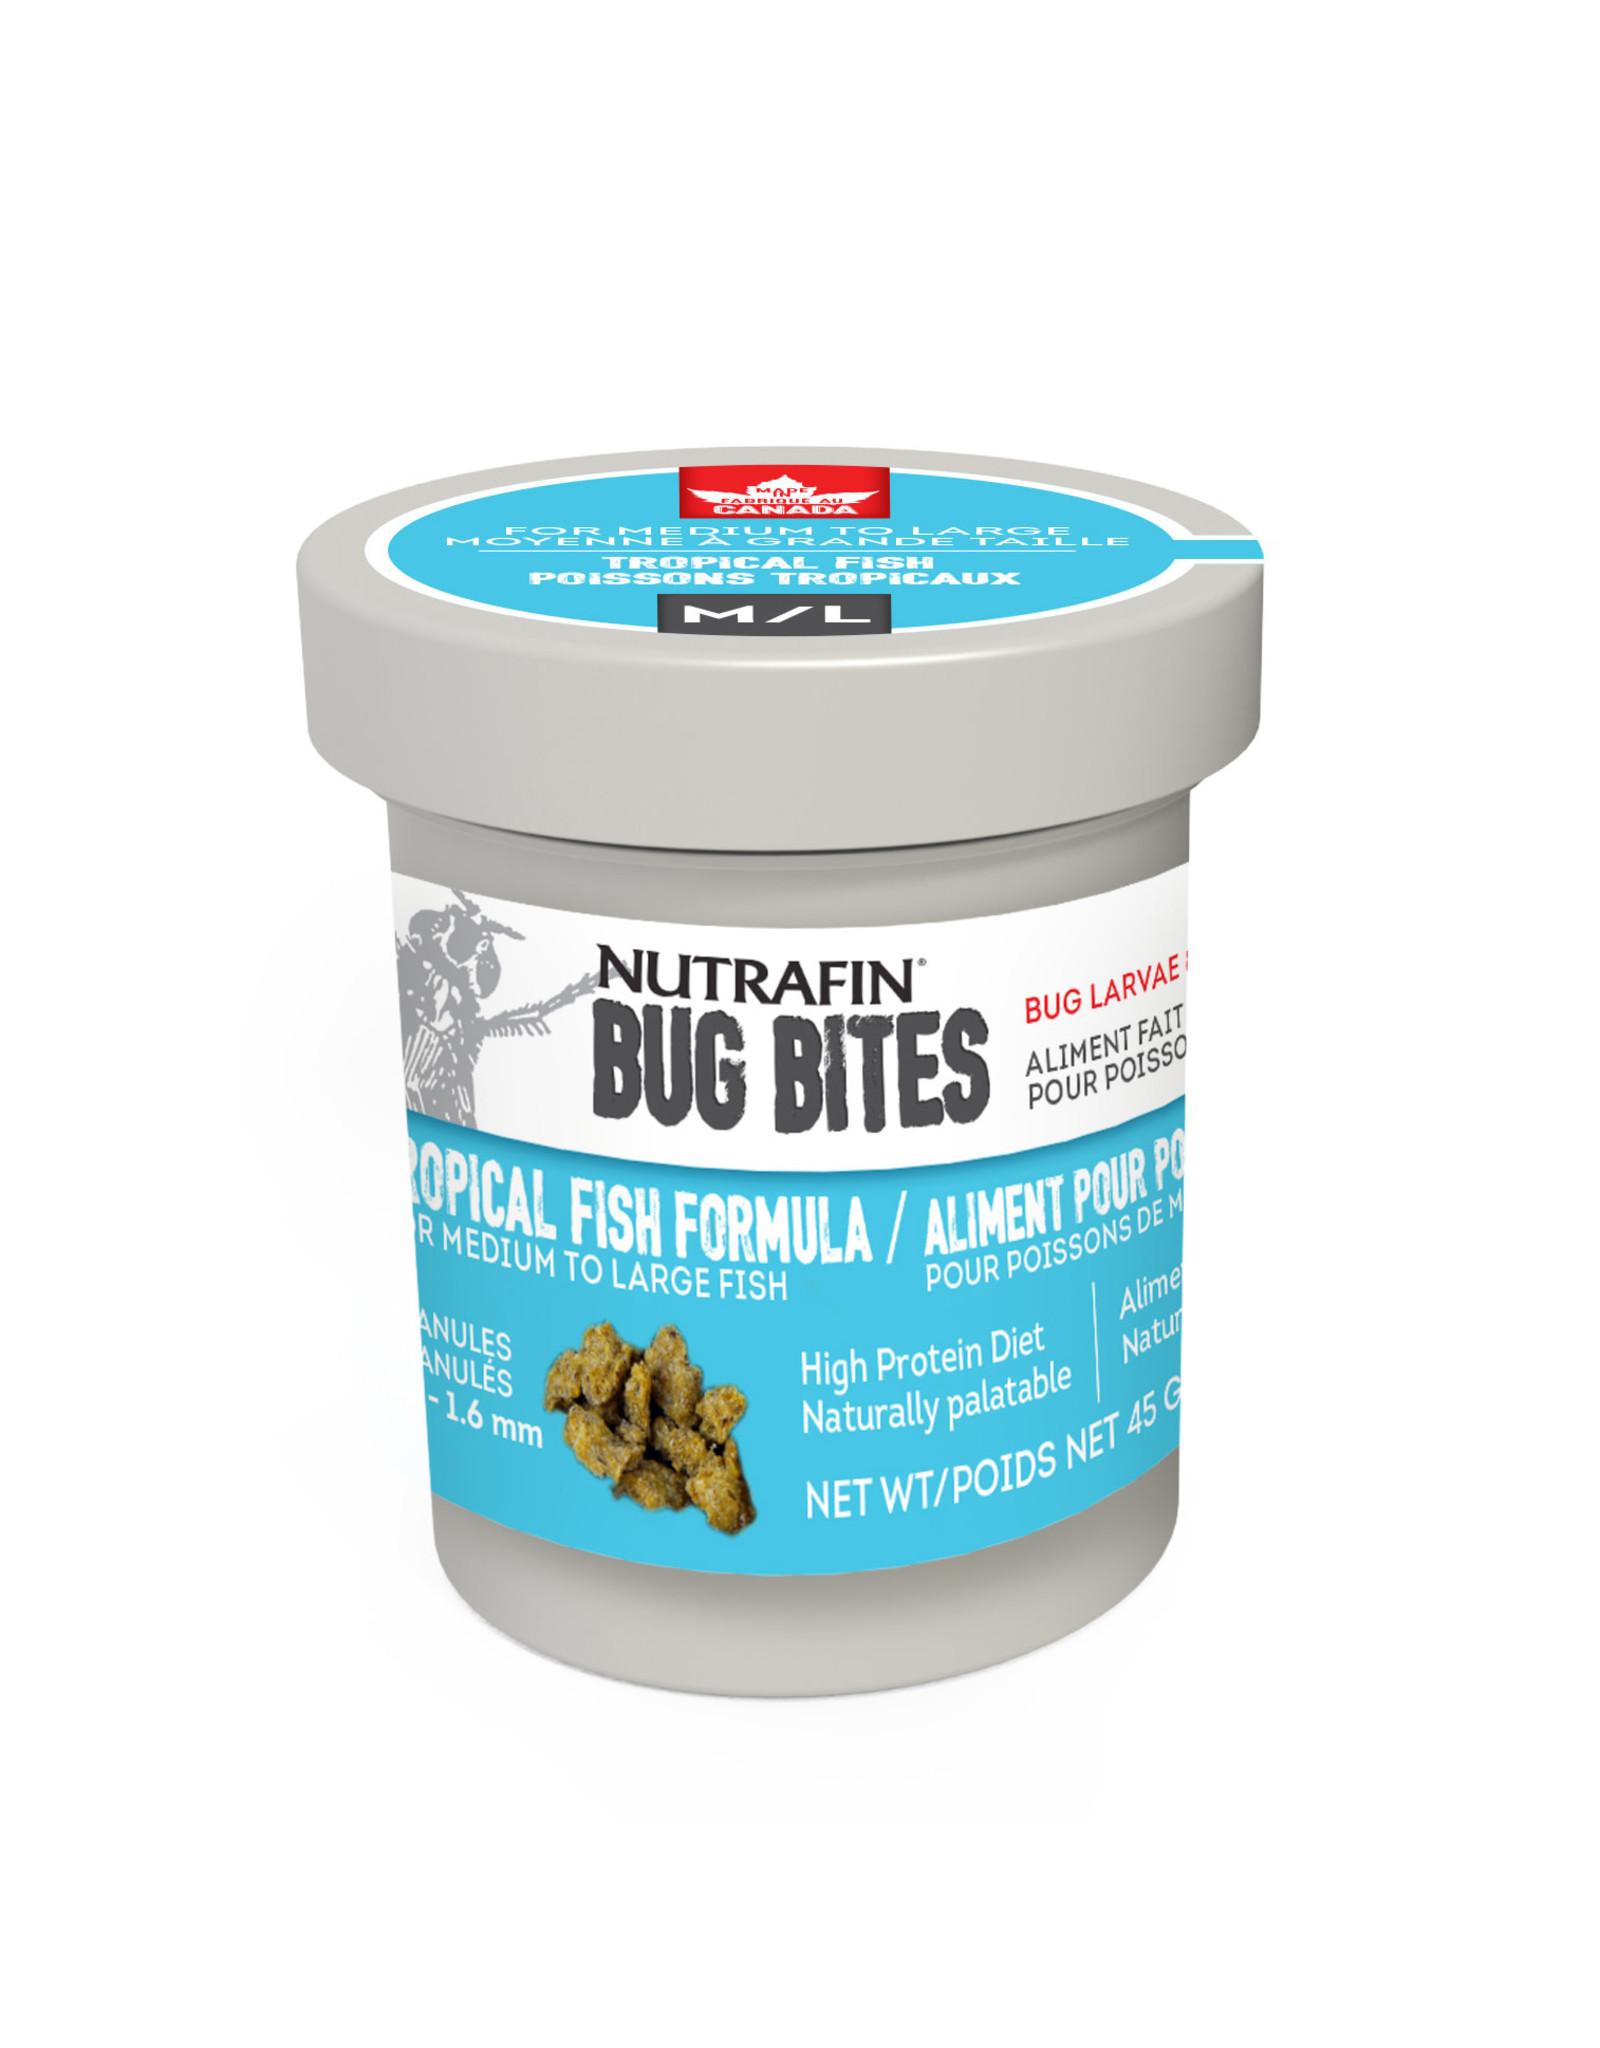 Nutrafin Bug Bites Tropical Medium-Large 1.4-1.6mm granules for Angels/Large Gouramis